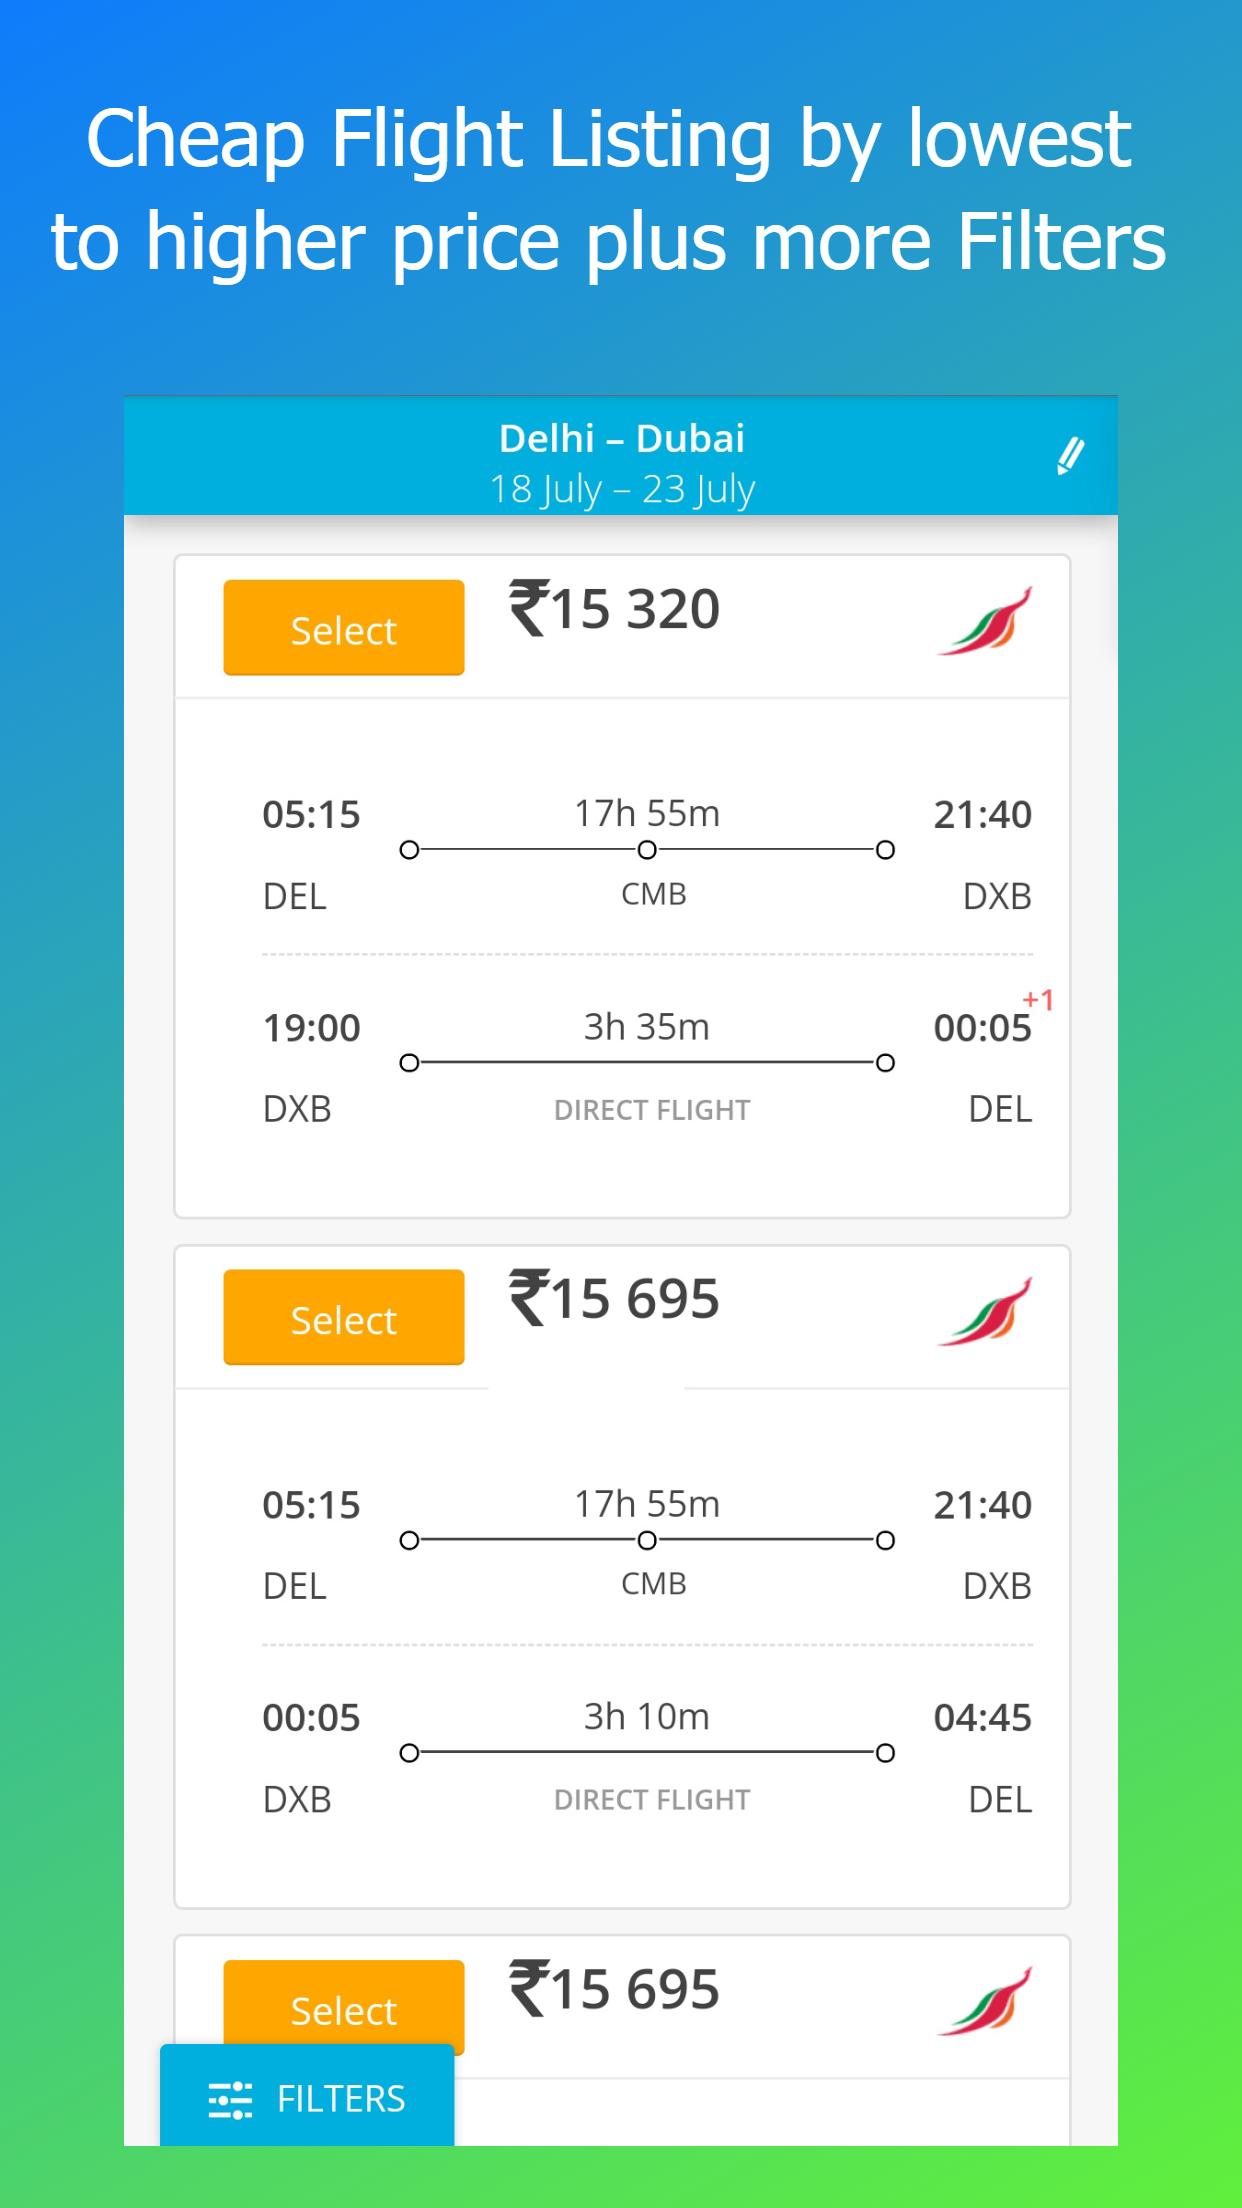 FastTreck Travels - Cheap Flight, Hotel & Holidays